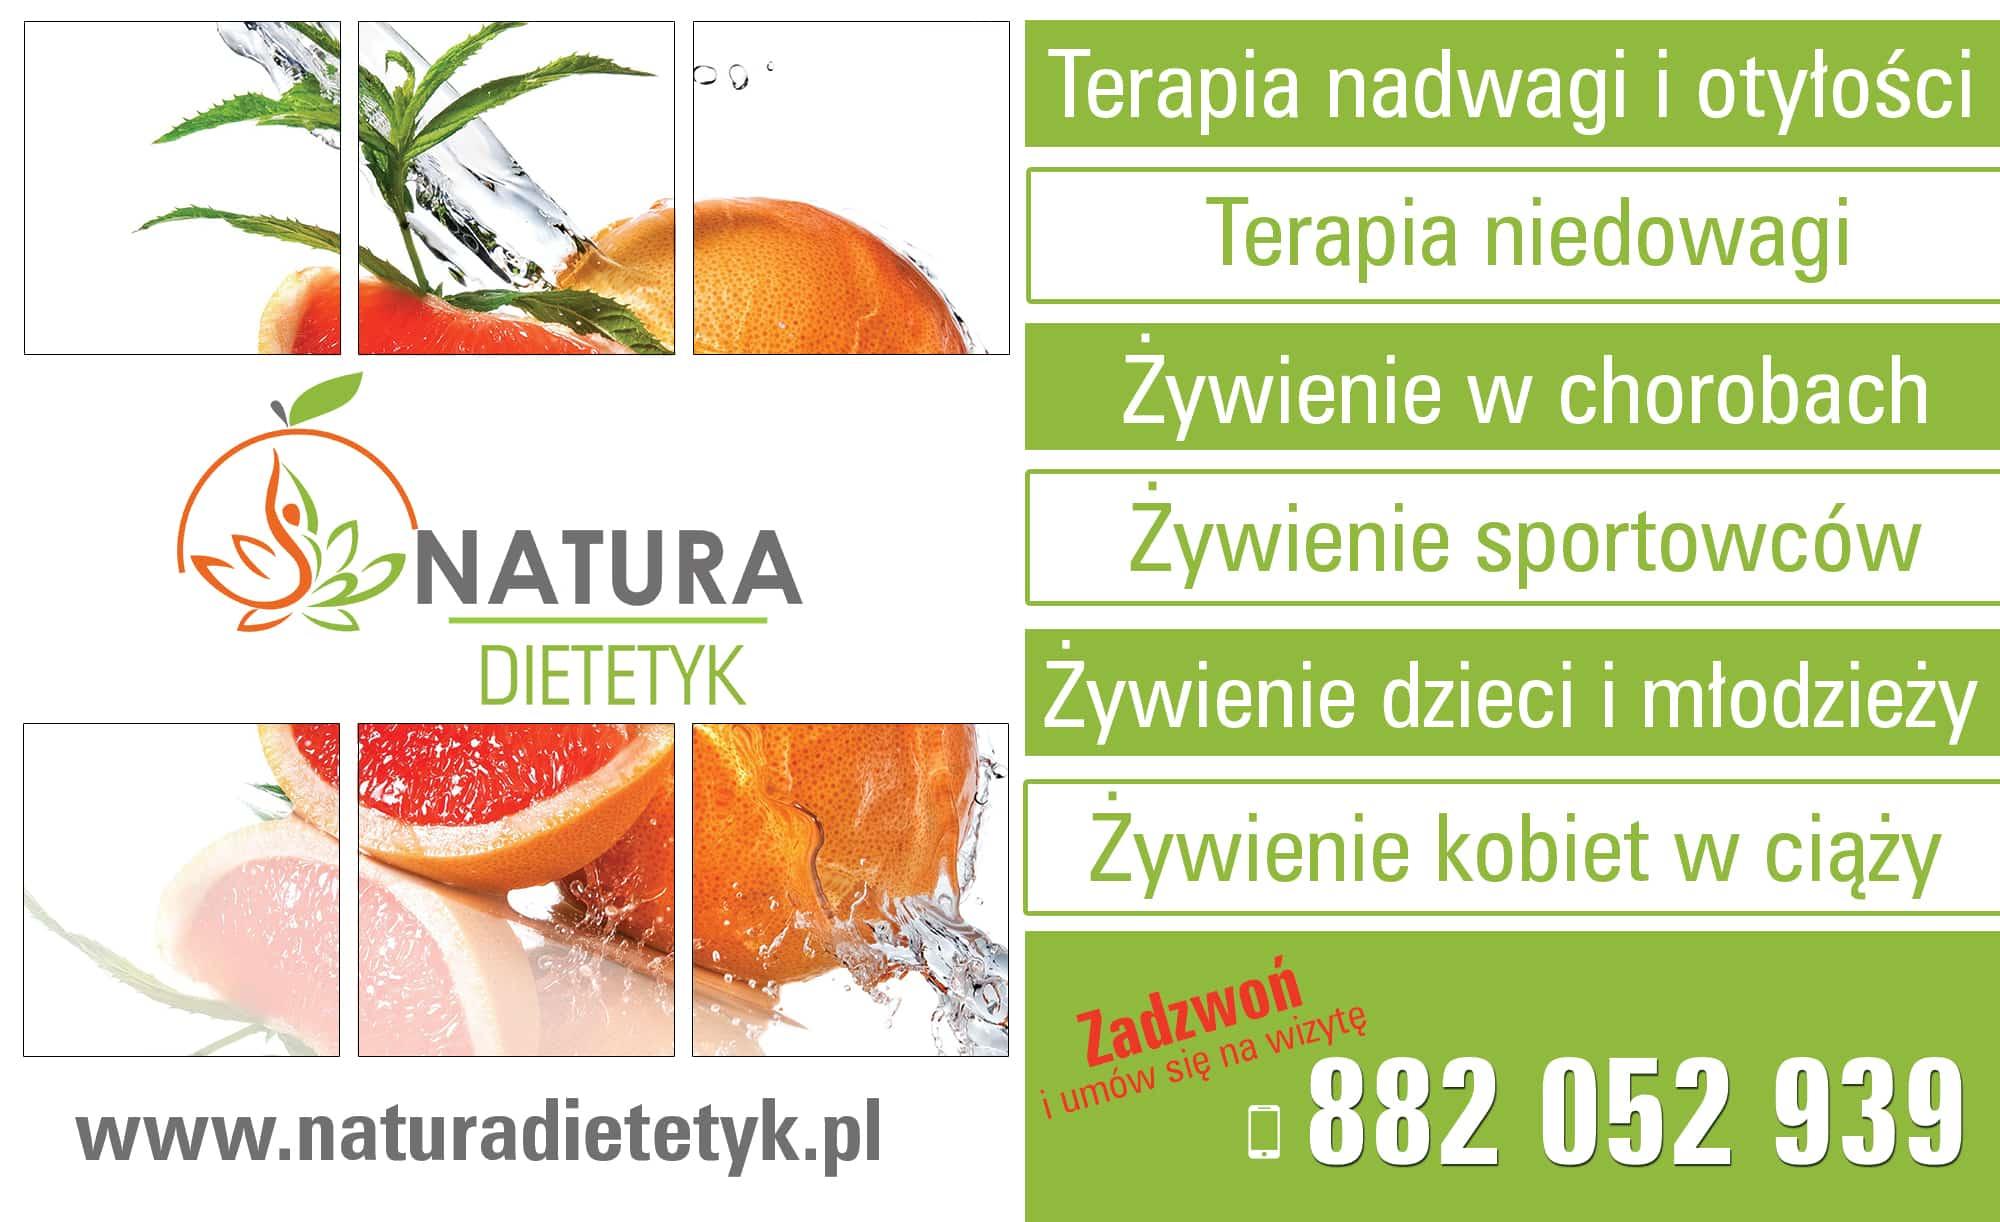 wizytowka-natura-dietetyk-grafika